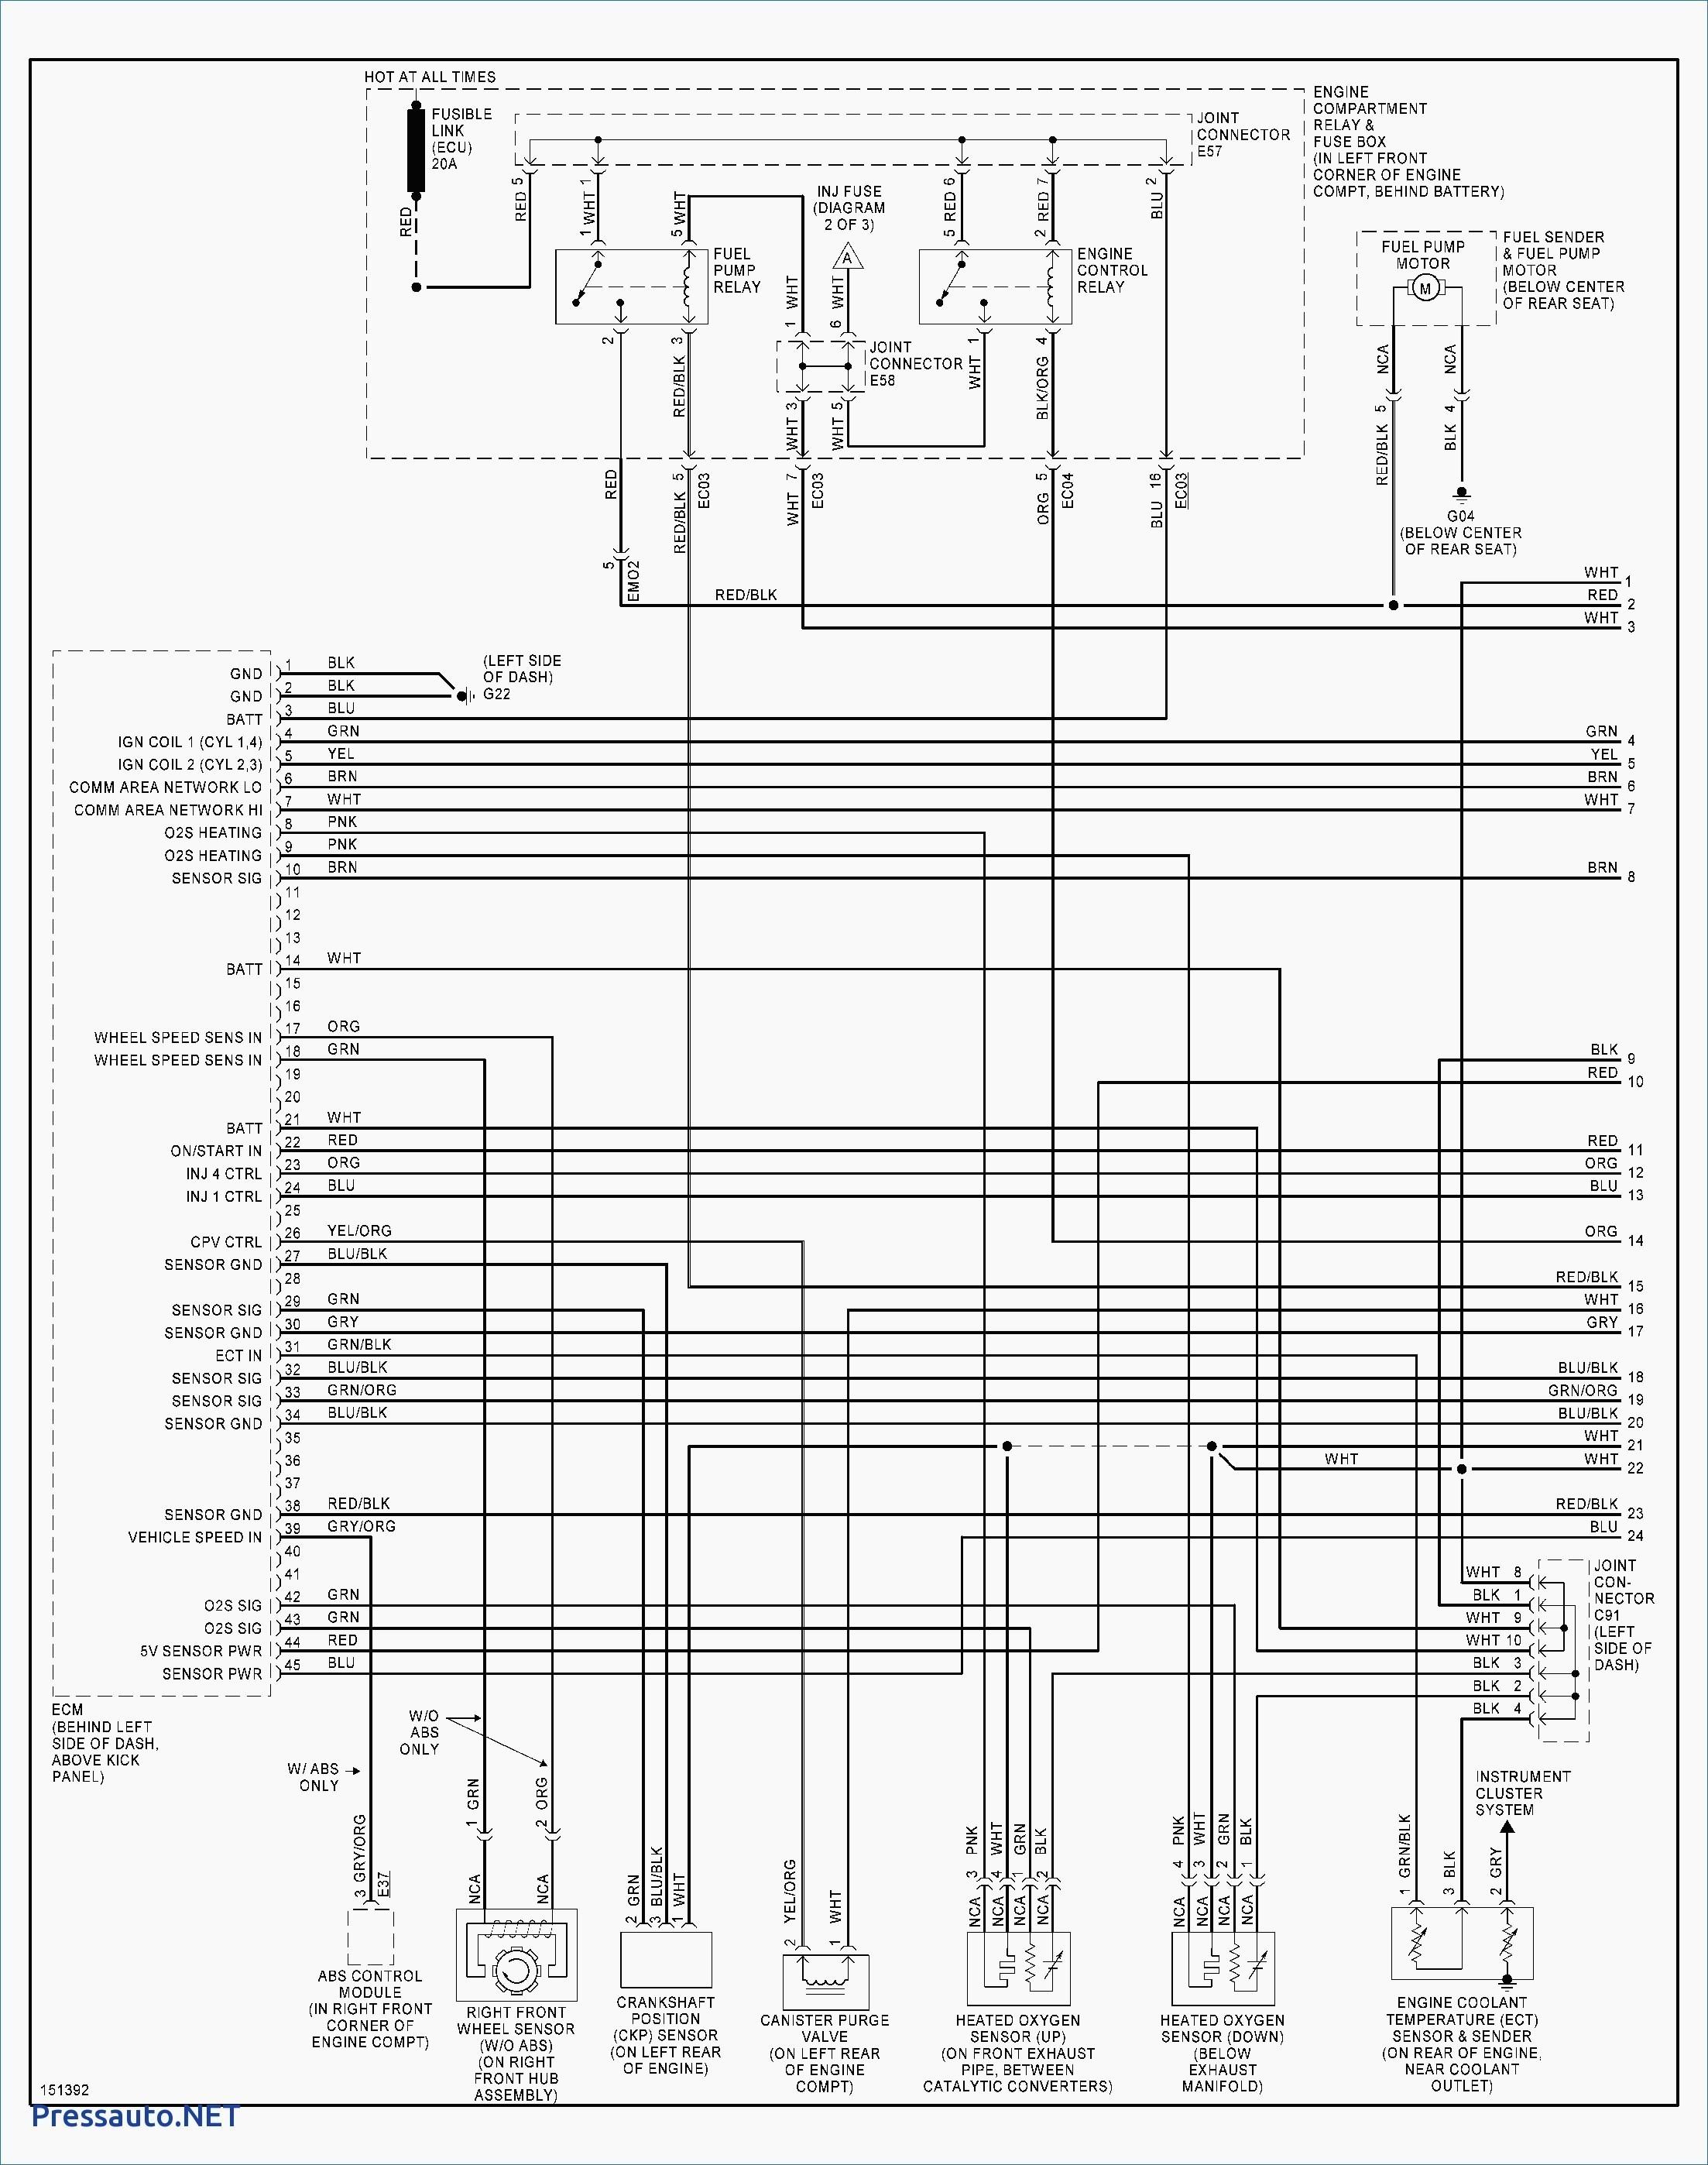 2005 Hyundai Tucson Engine Diagram 2001 Hyundai Tiburon Engine Diagram Wiring Diagram Used Of 2005 Hyundai Tucson Engine Diagram